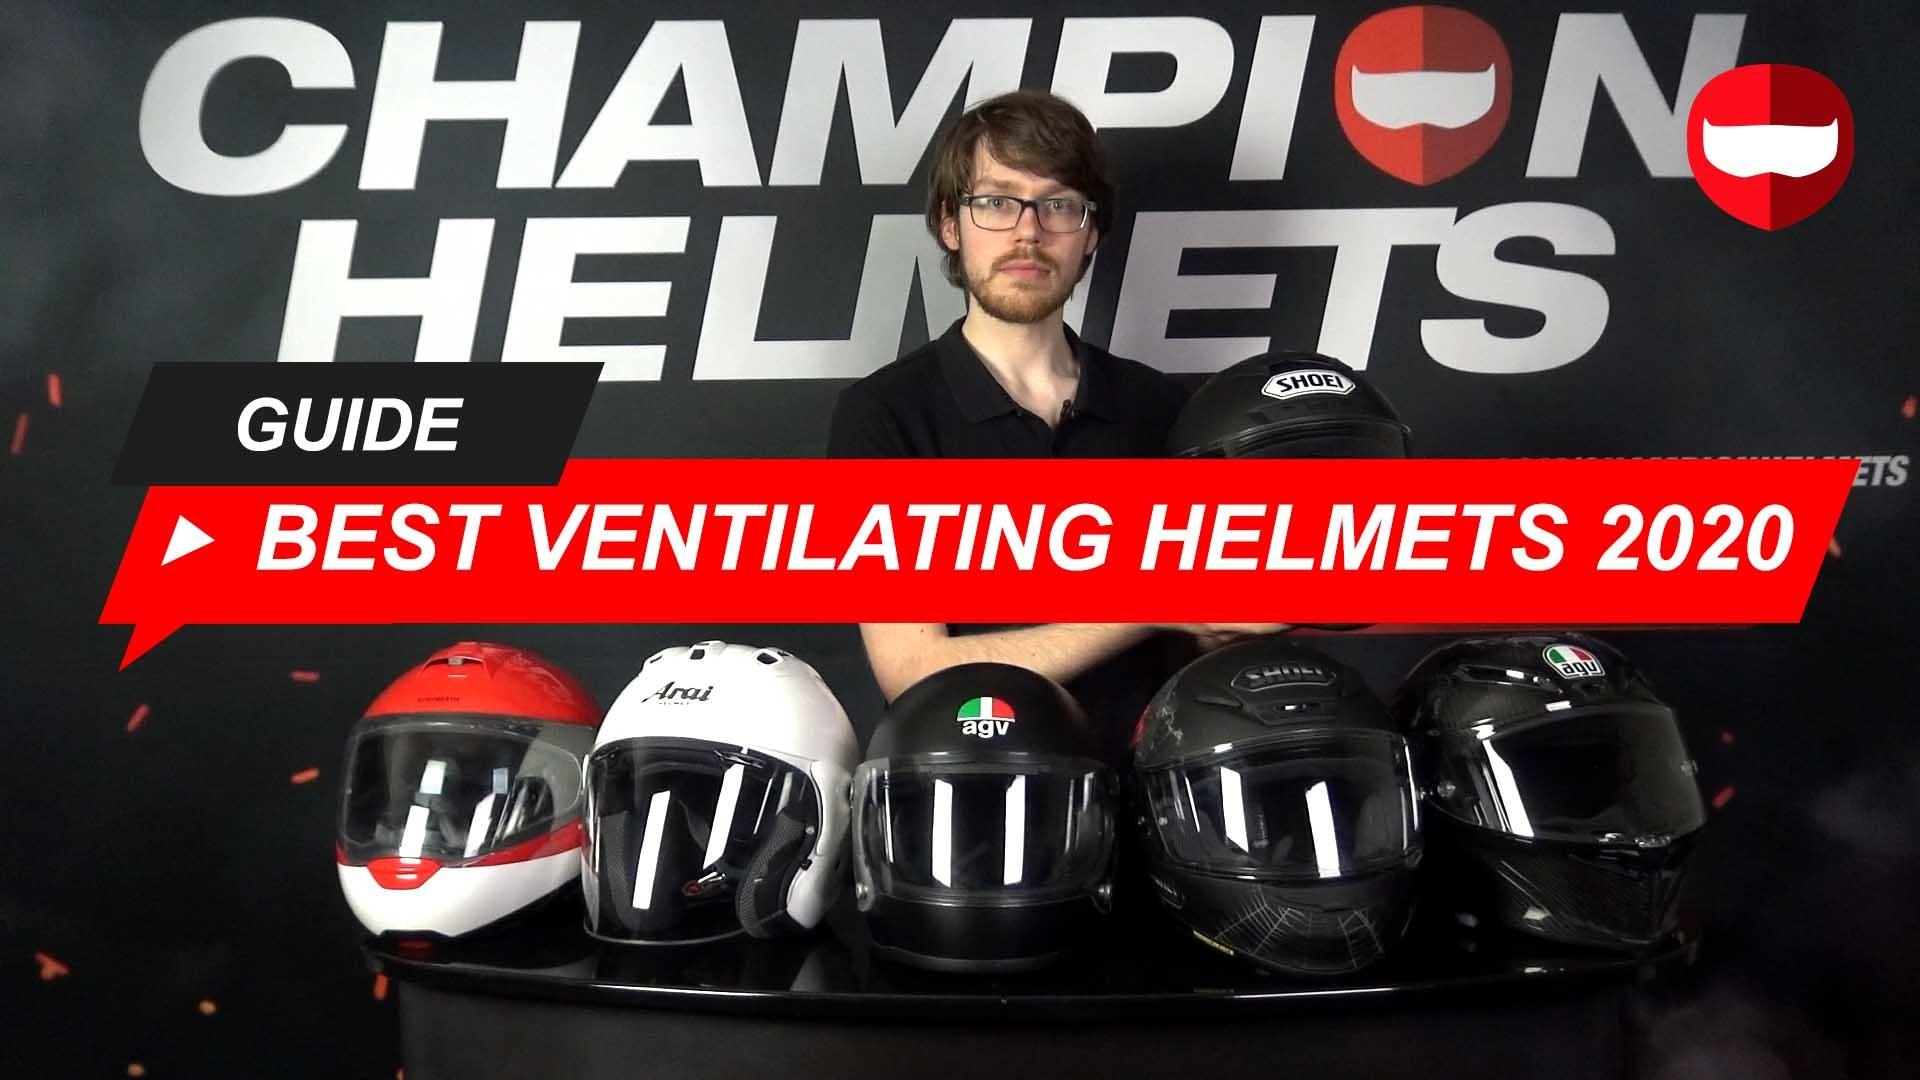 Best Ventilating Helmets 2020 + Video